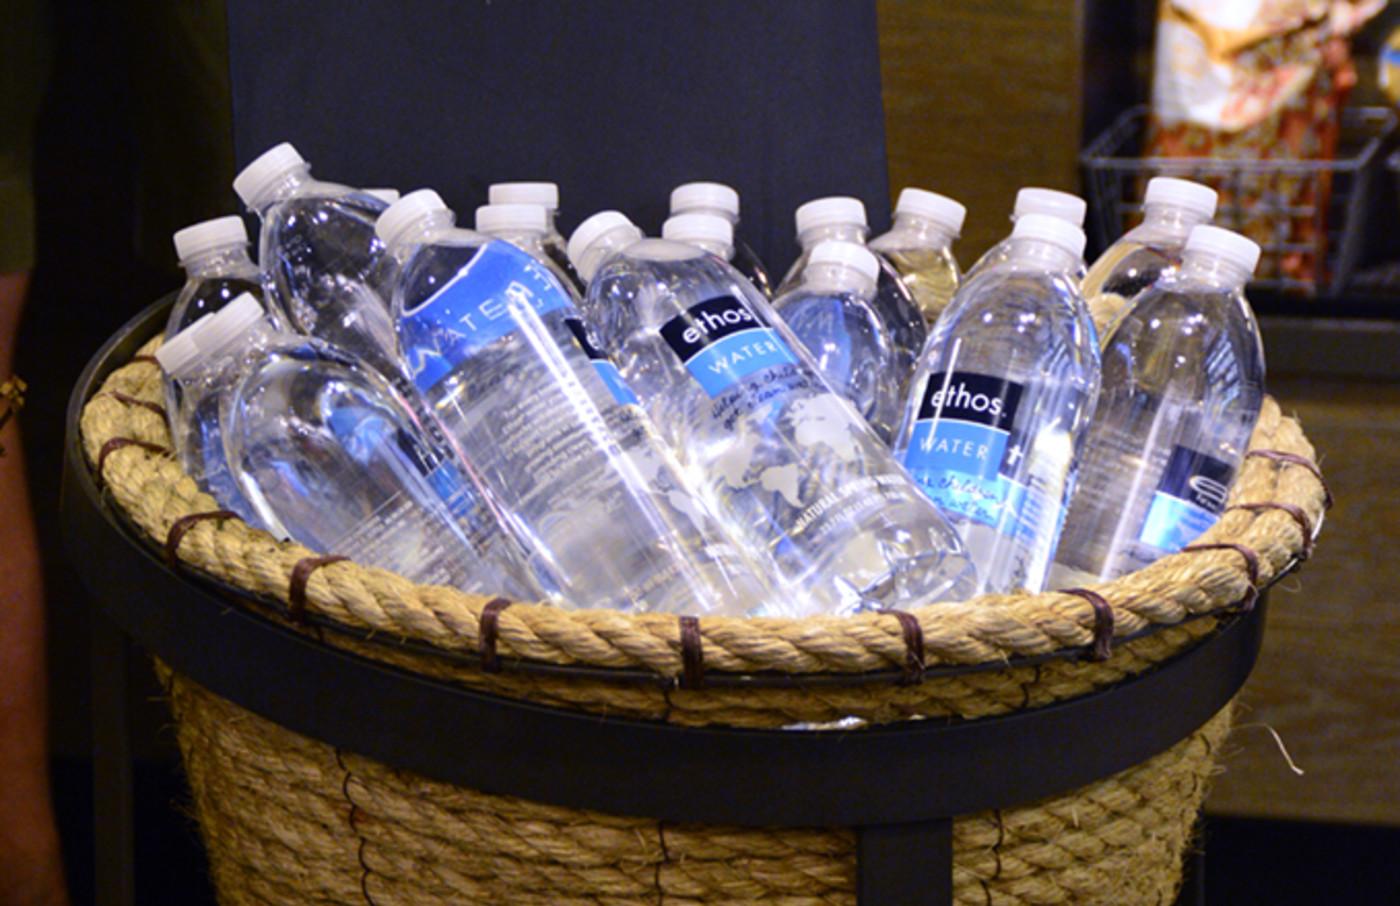 robert-alexander-water-bottles-getty